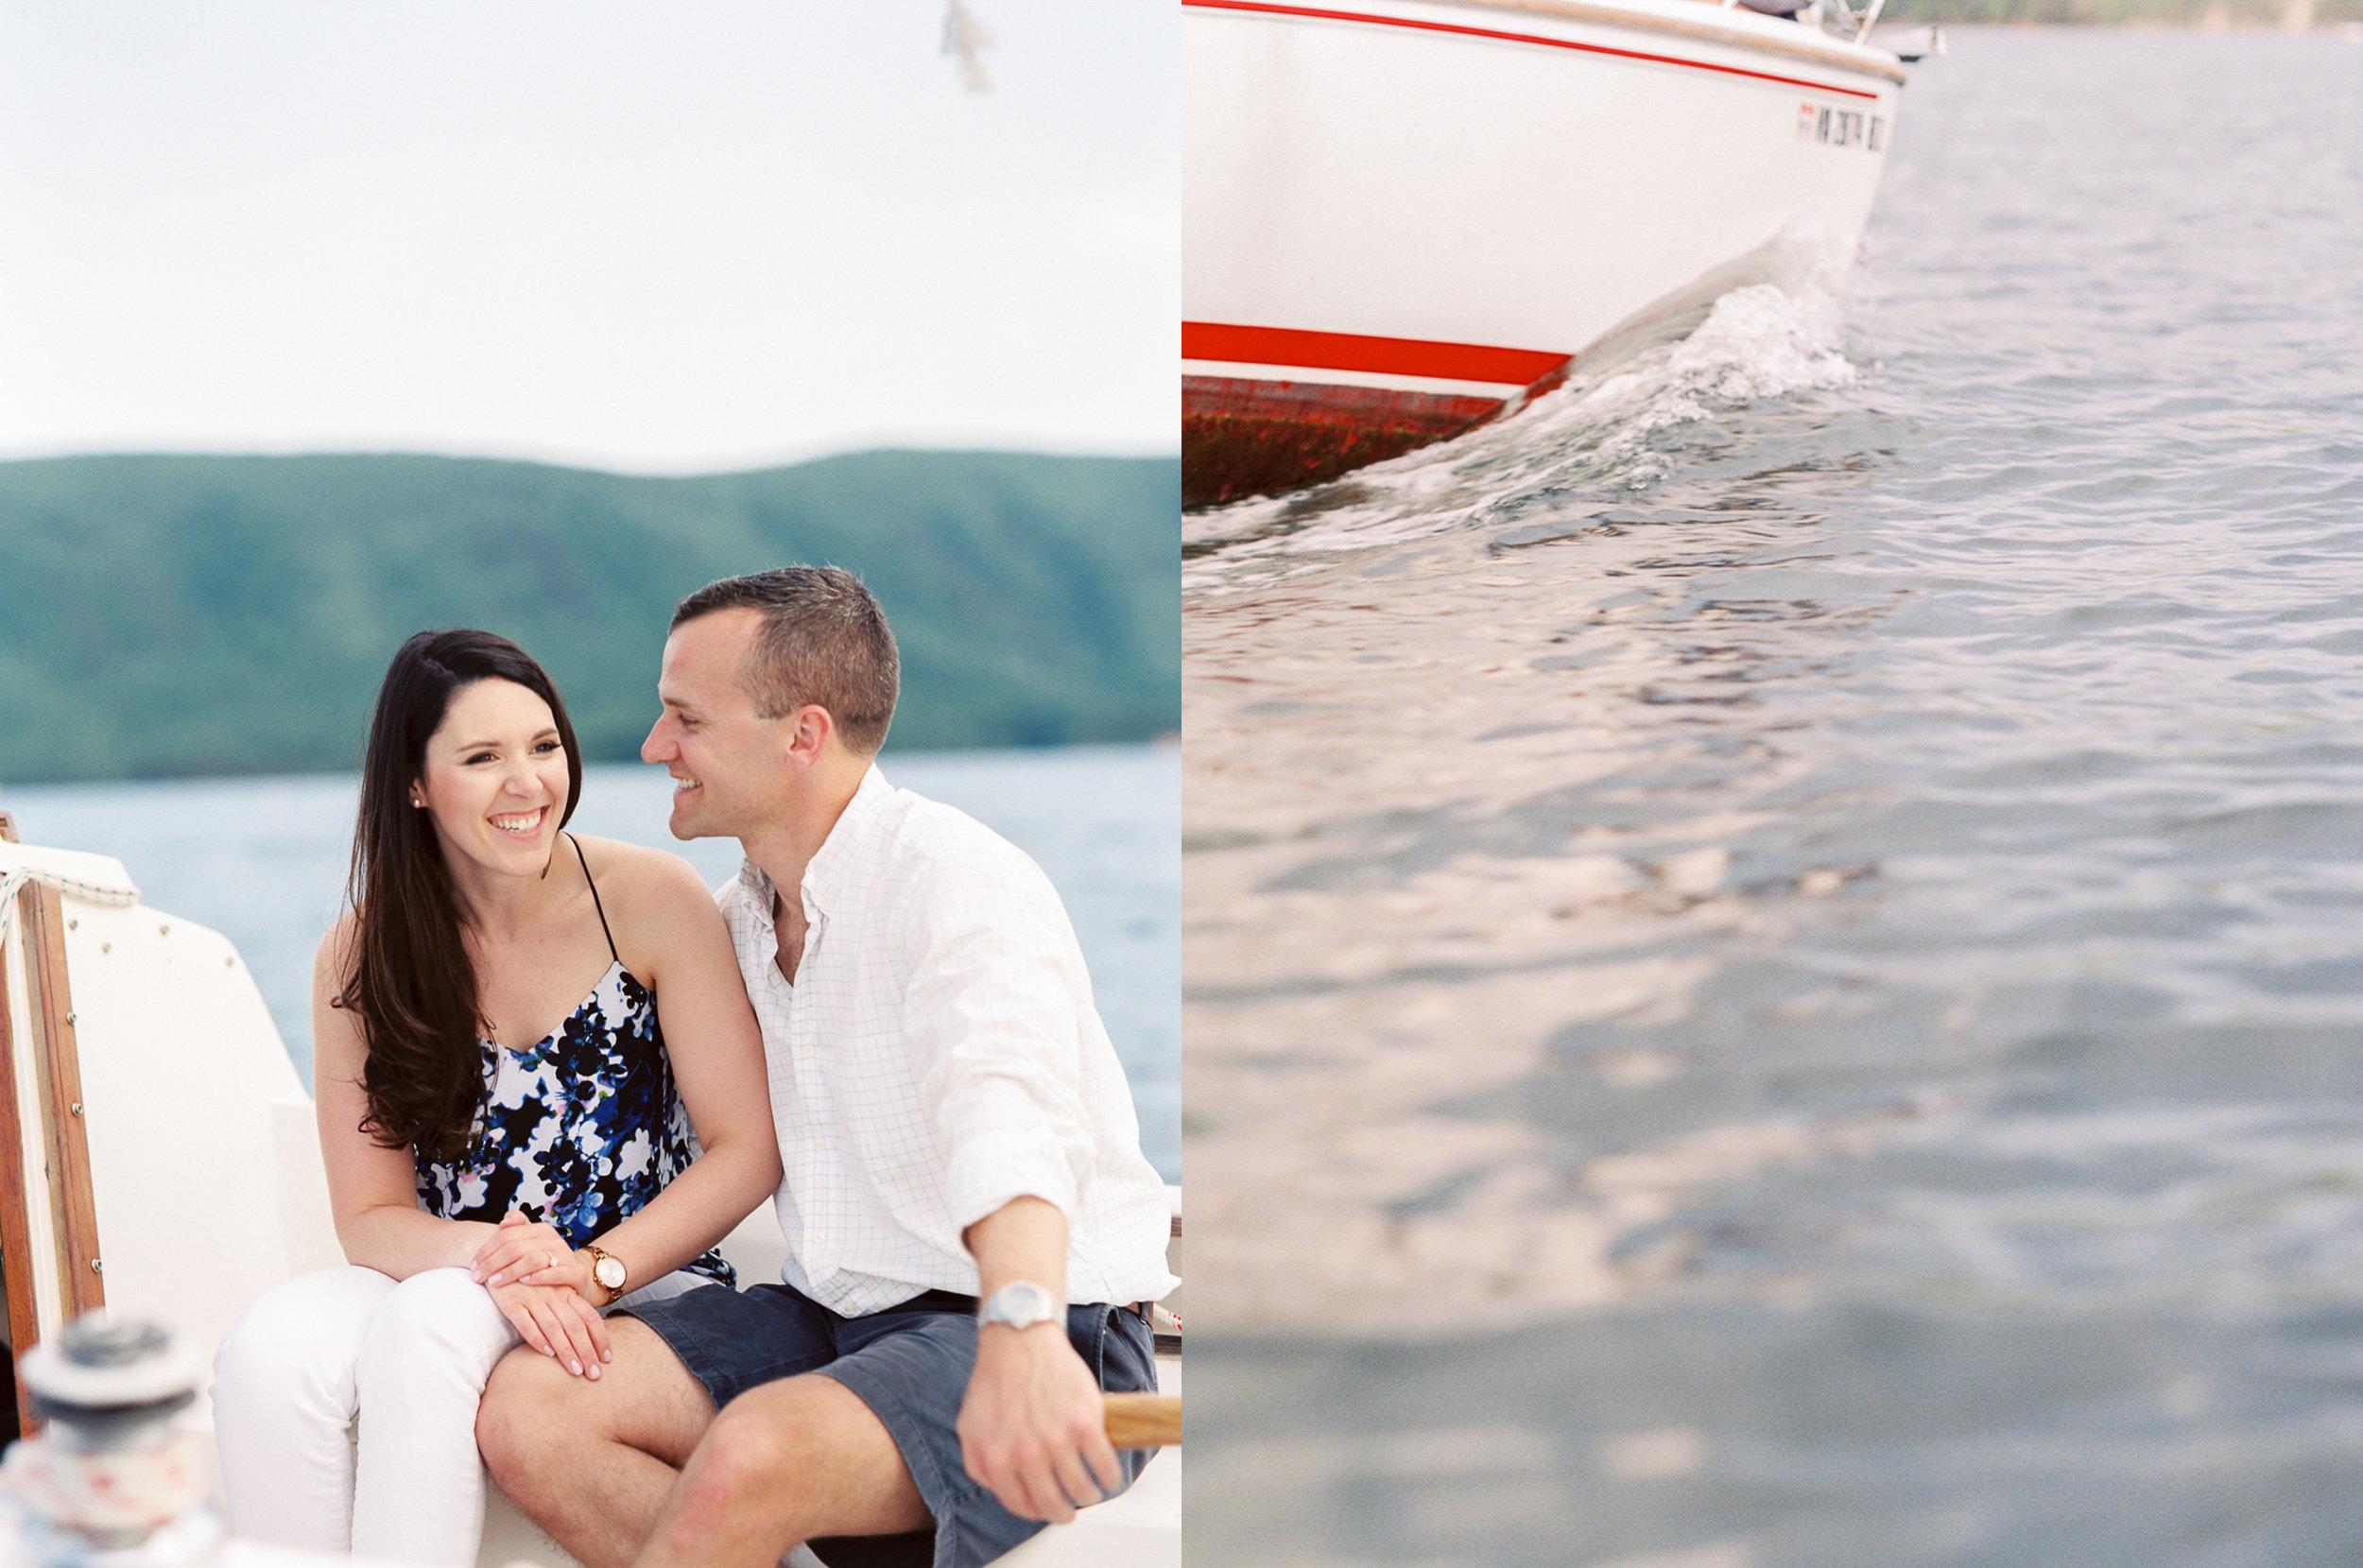 smith-mountain-lake-sailboat-engagement-session-charlotte-sailing-photographer-5.jpg